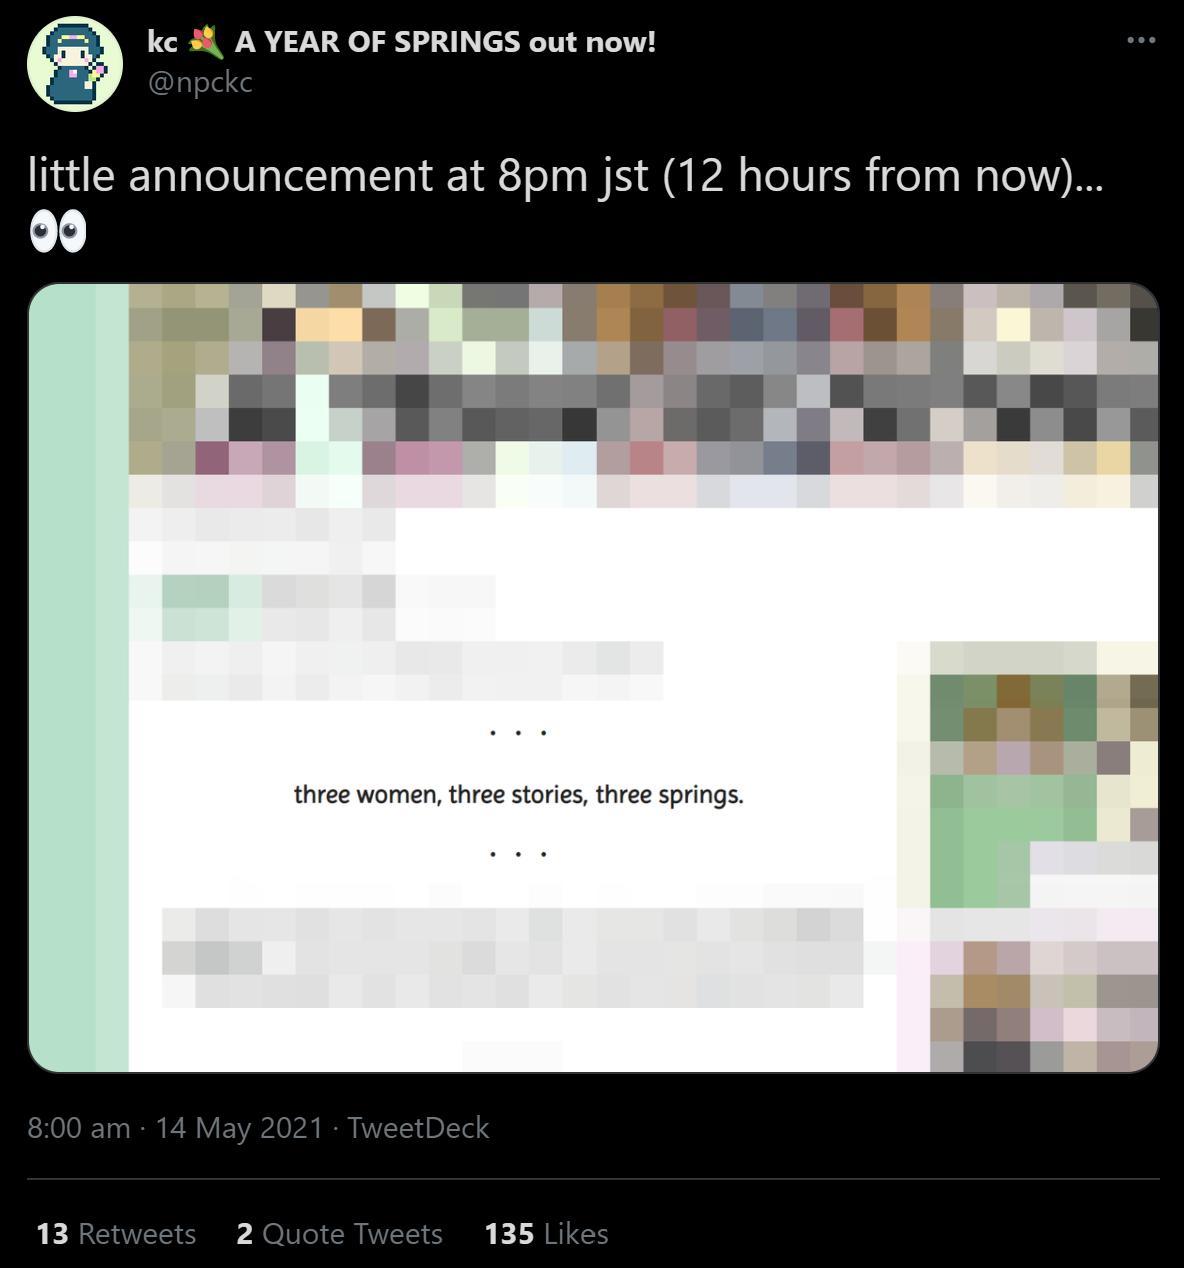 pre-release tweet with 13 retweets, 2 quote tweets, 135 likes